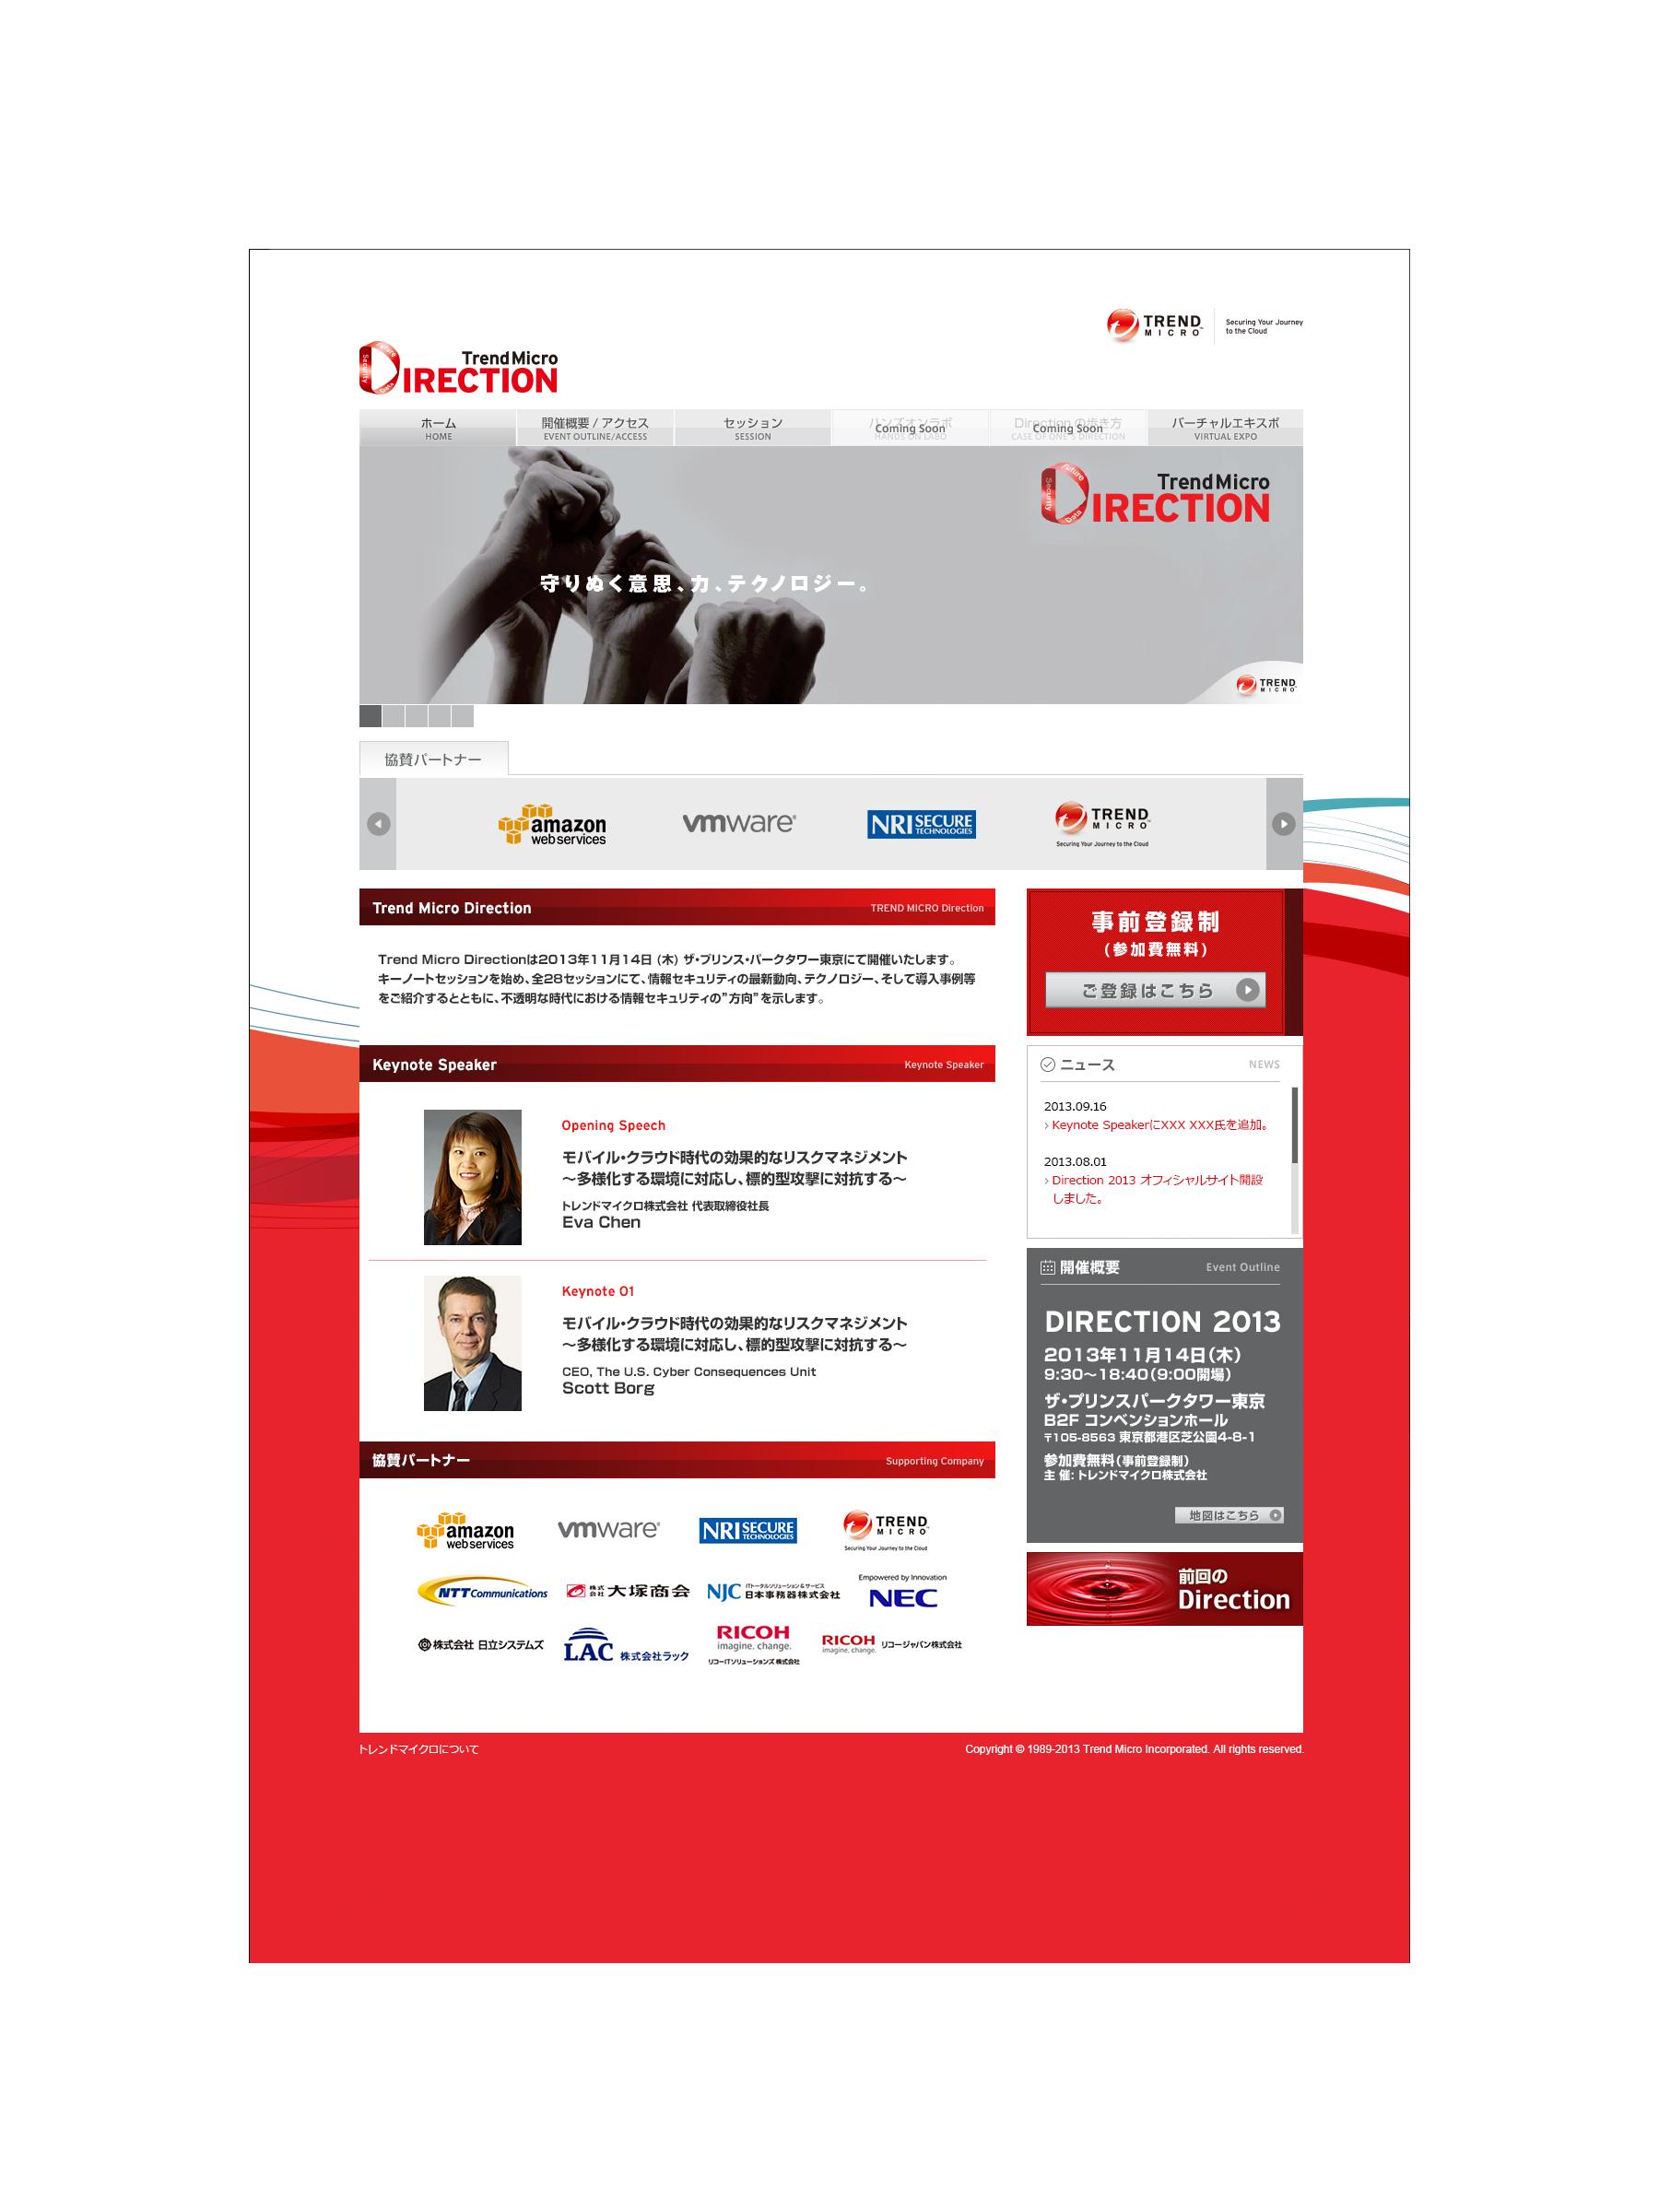 TrendMicro DIRECTION 2013 公式WEBサイト